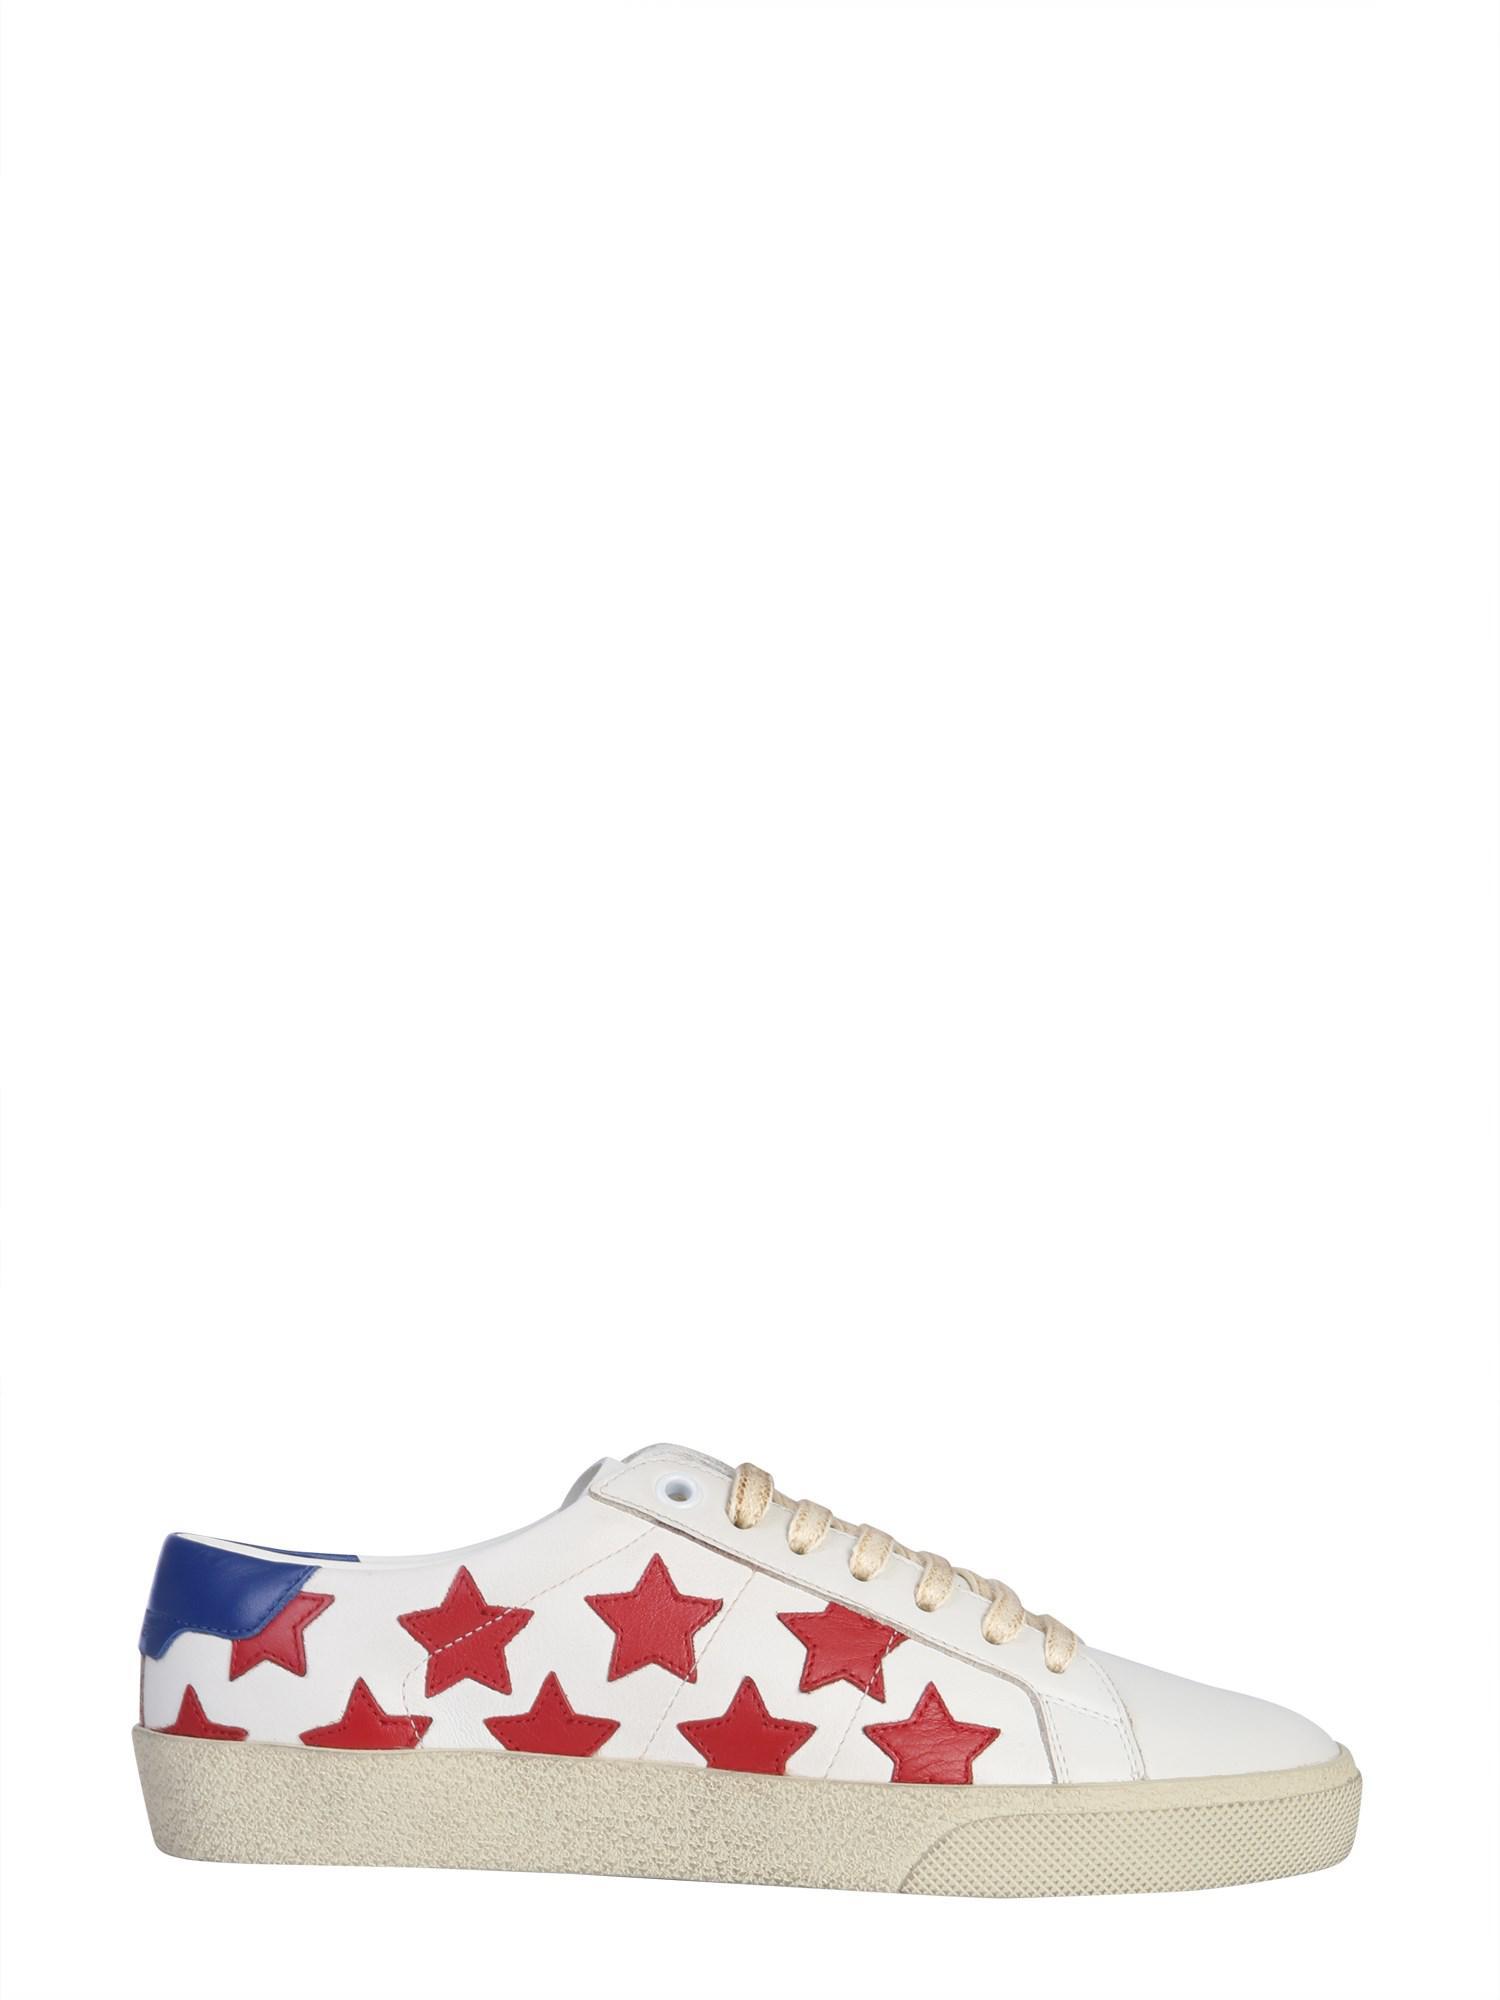 dce3ac22d96 Lyst - Saint Laurent Court Classic Sl/06 California Sneakers In ...